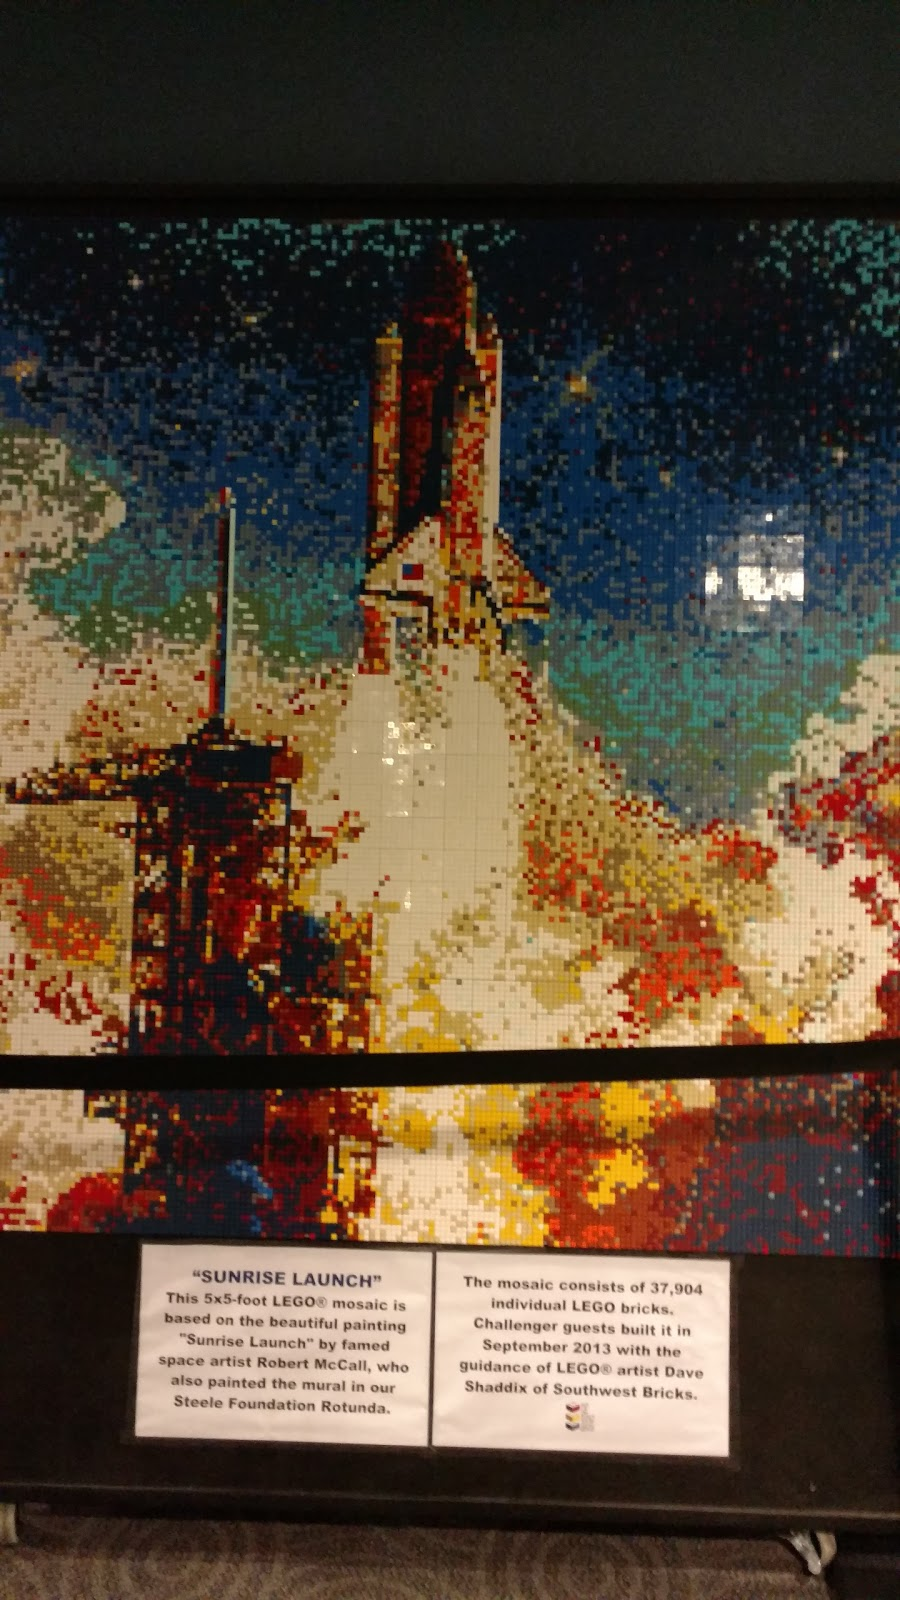 Arizona Challenger Space Center - museum    Photo 9 of 10   Address: 17835 N 44th St, Phoenix, AZ 85032, USA   Phone: (623) 322-2001